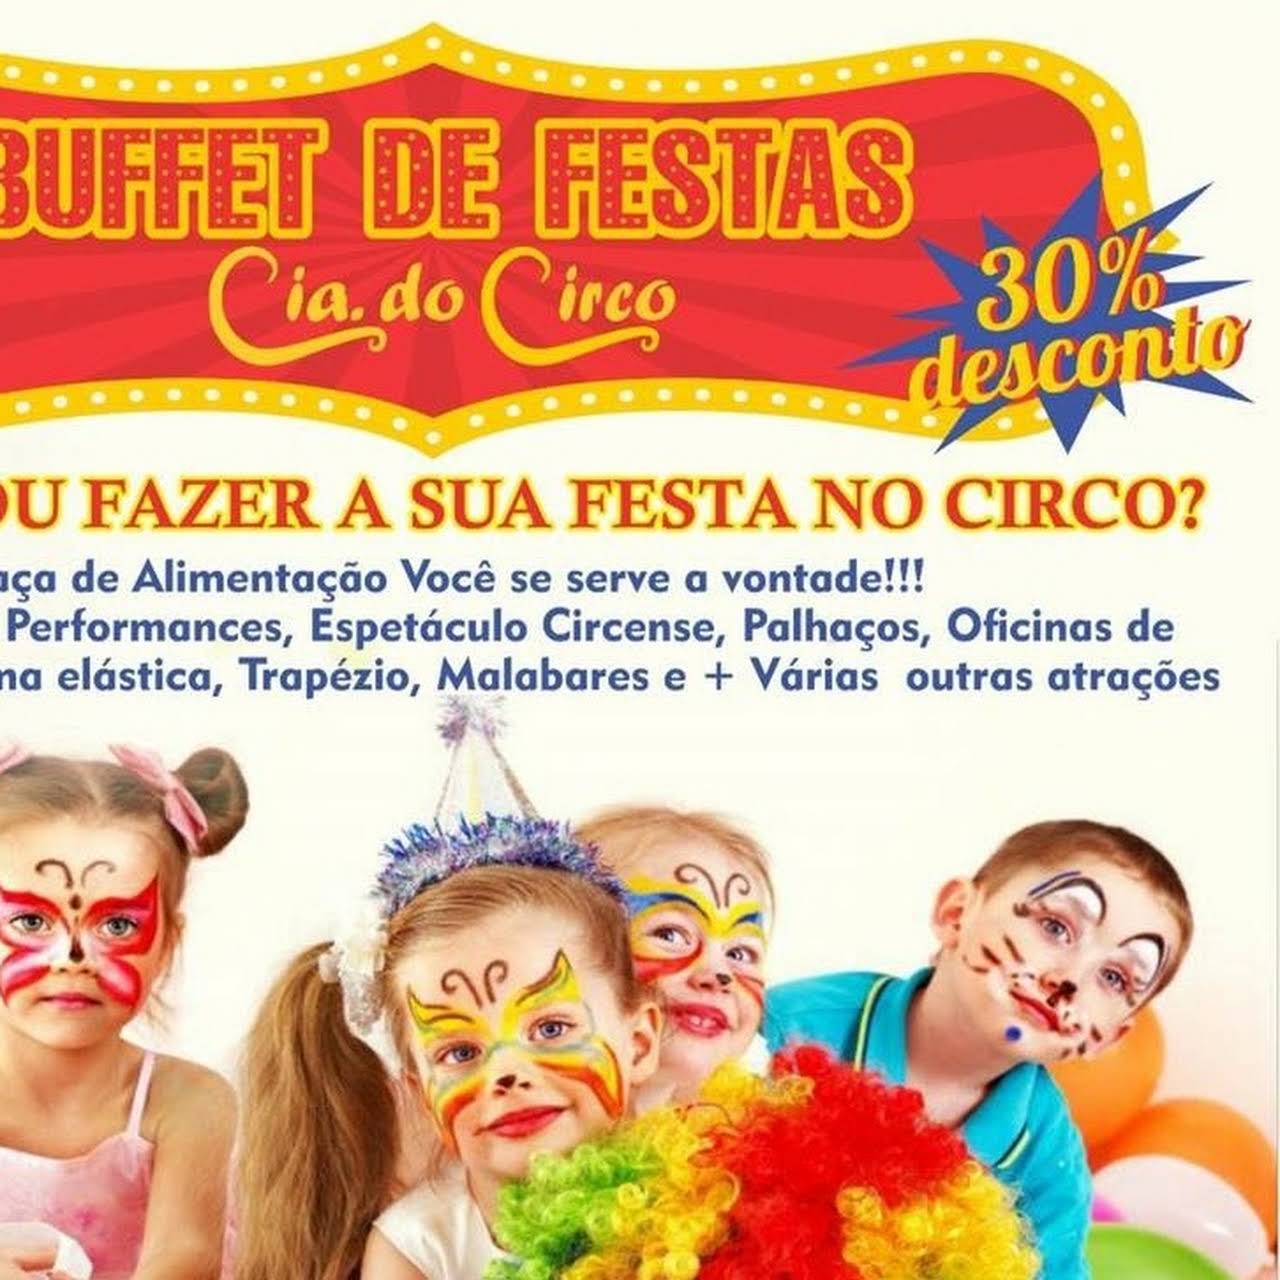 Tremendous Cia Do Circo Escola De Circo Buffet De Festas Academia Home Interior And Landscaping Mentranervesignezvosmurscom